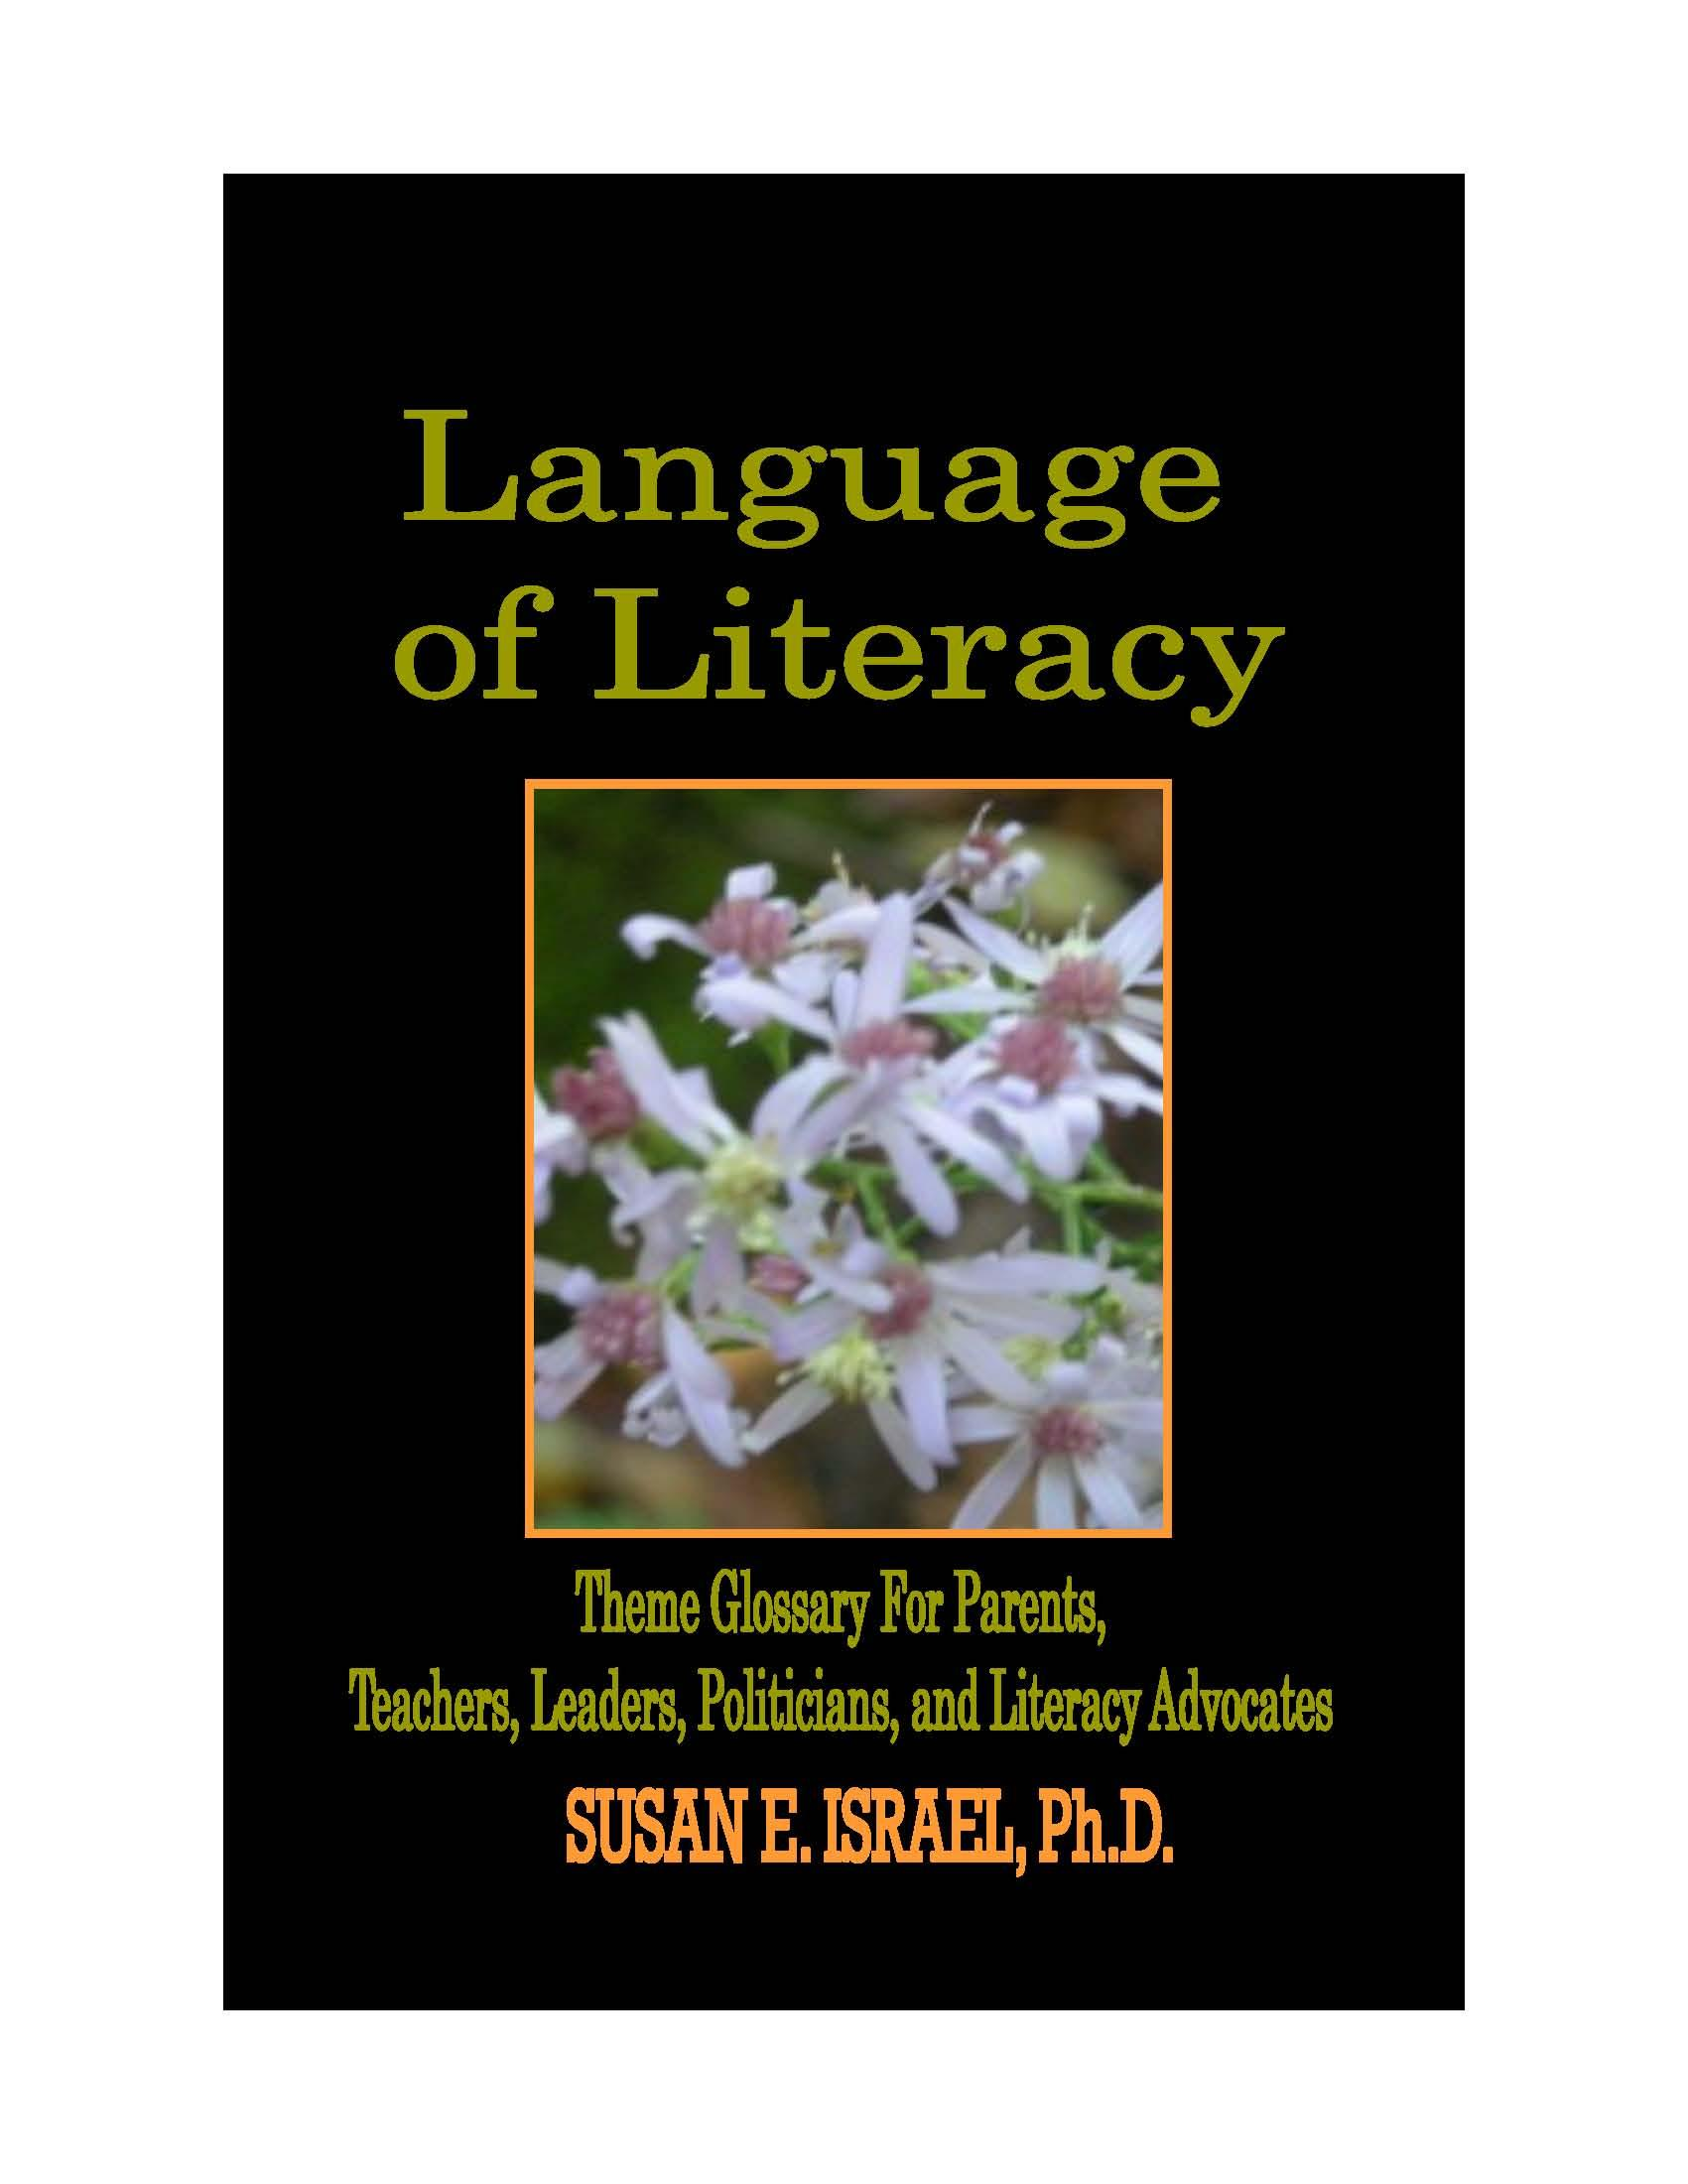 Language of Literacy EB9780984202614